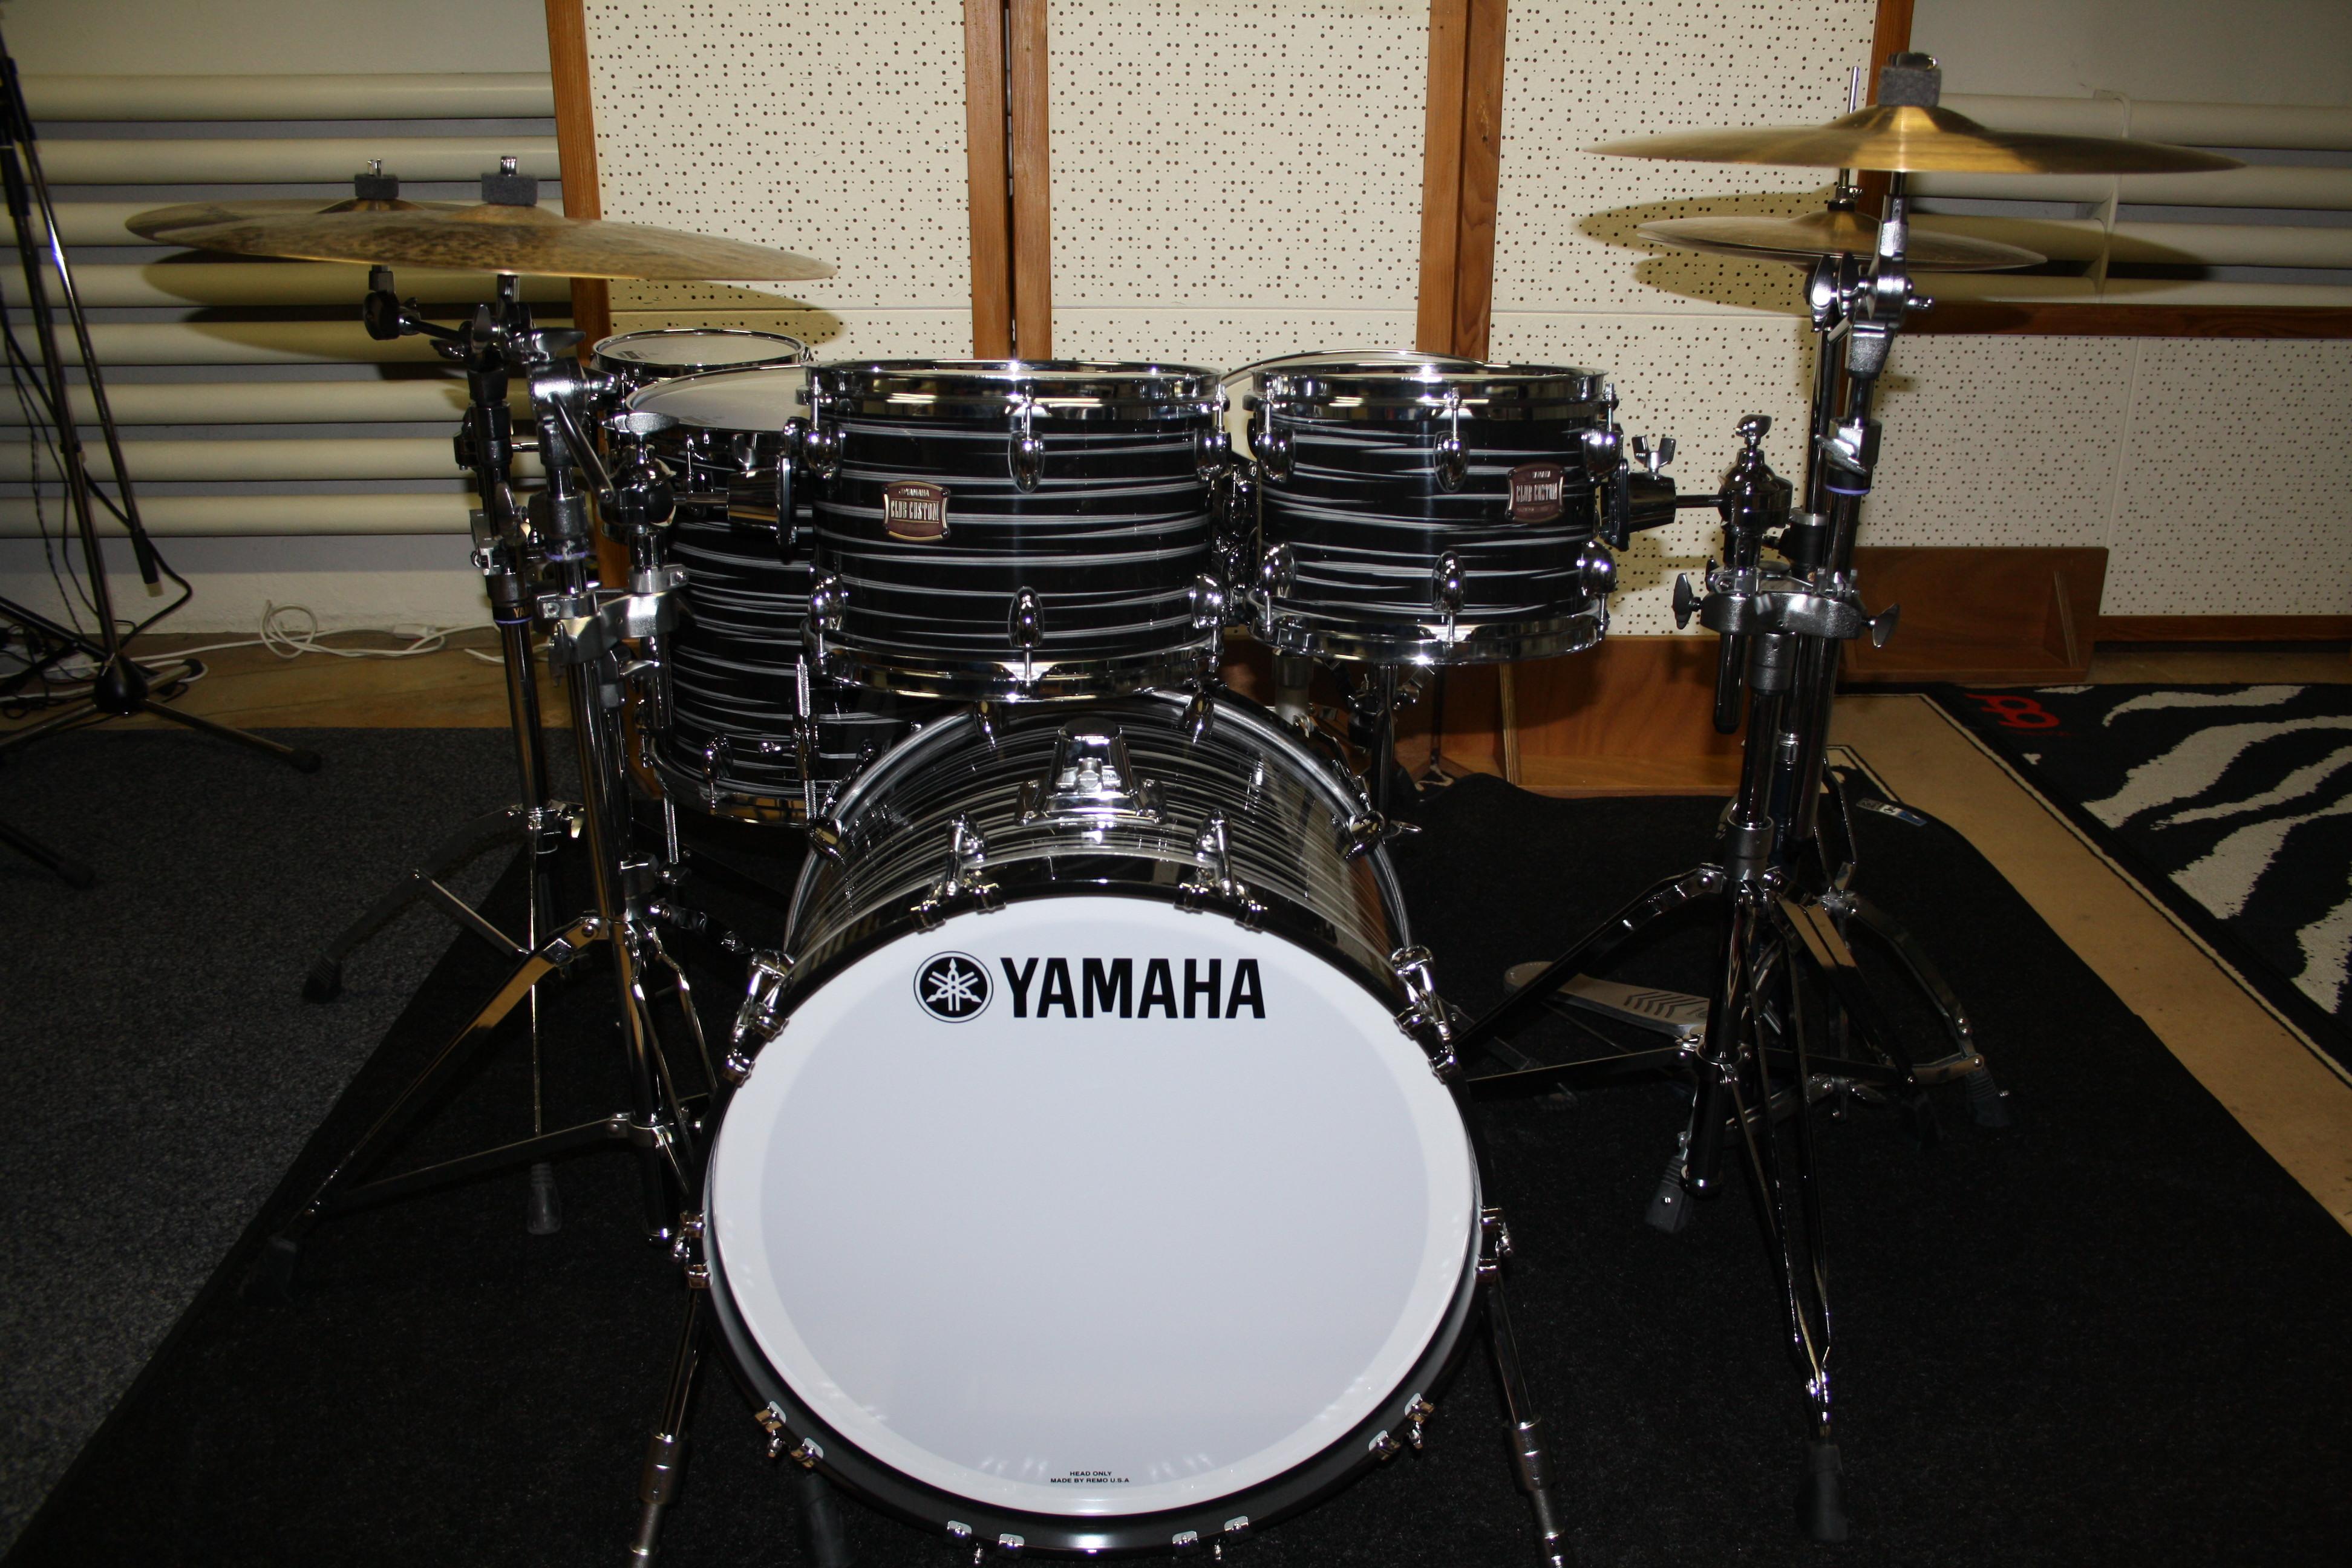 Yamaha Drums Wikiwand